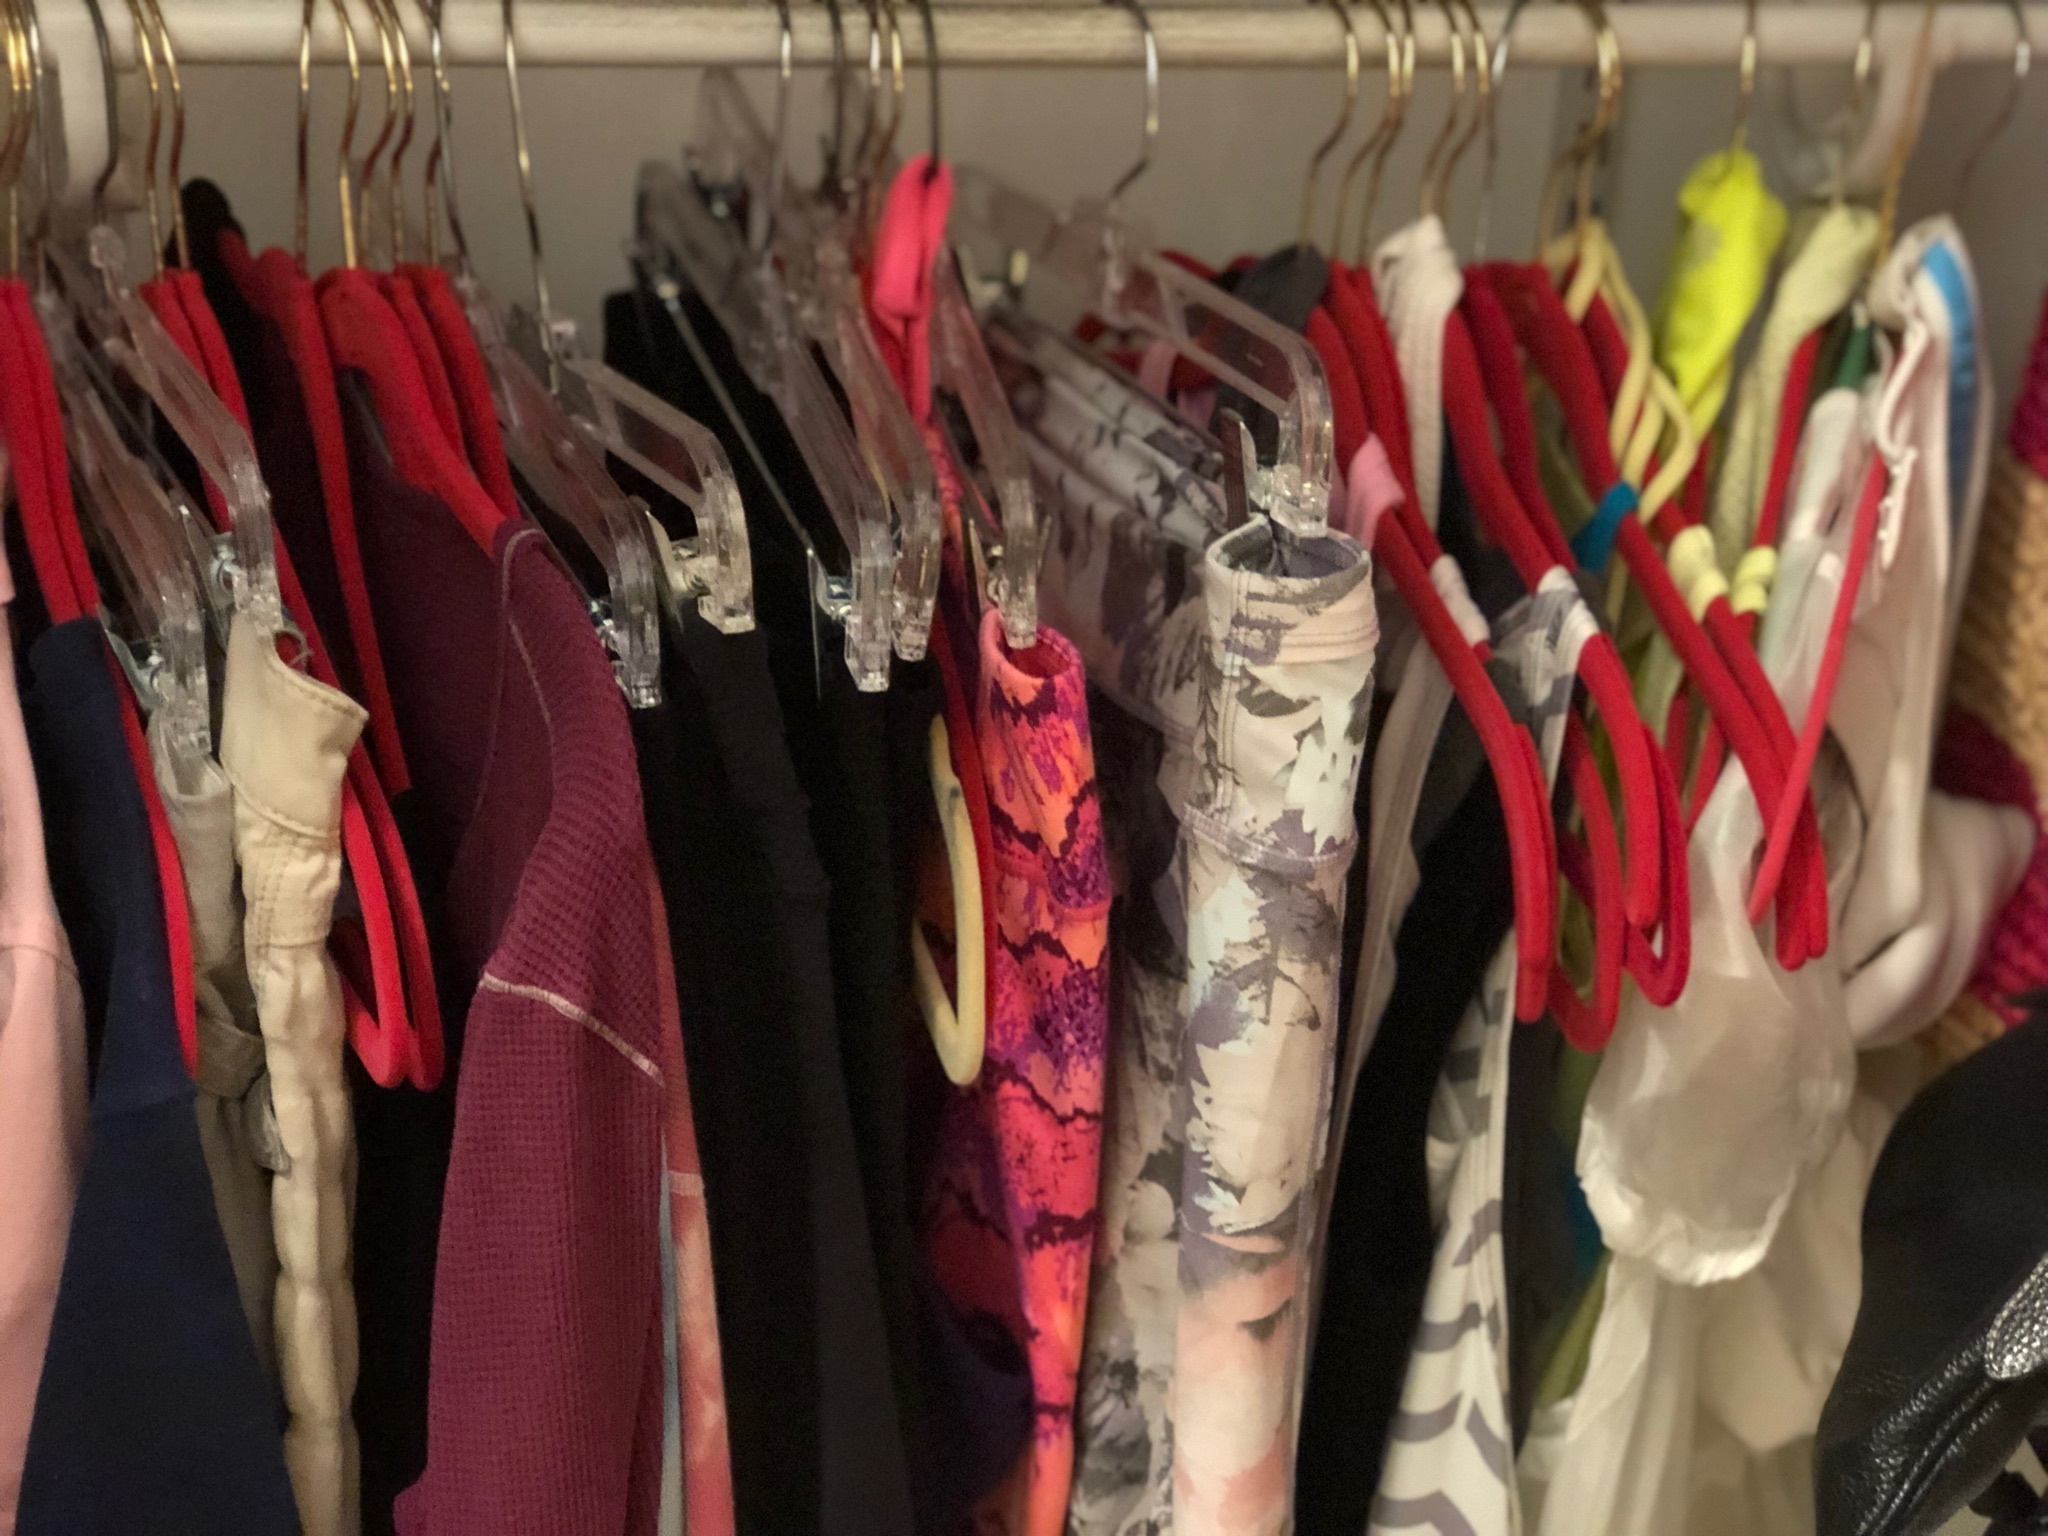 Dr Julie Marshall - Closet Cleanup 2.jpeg